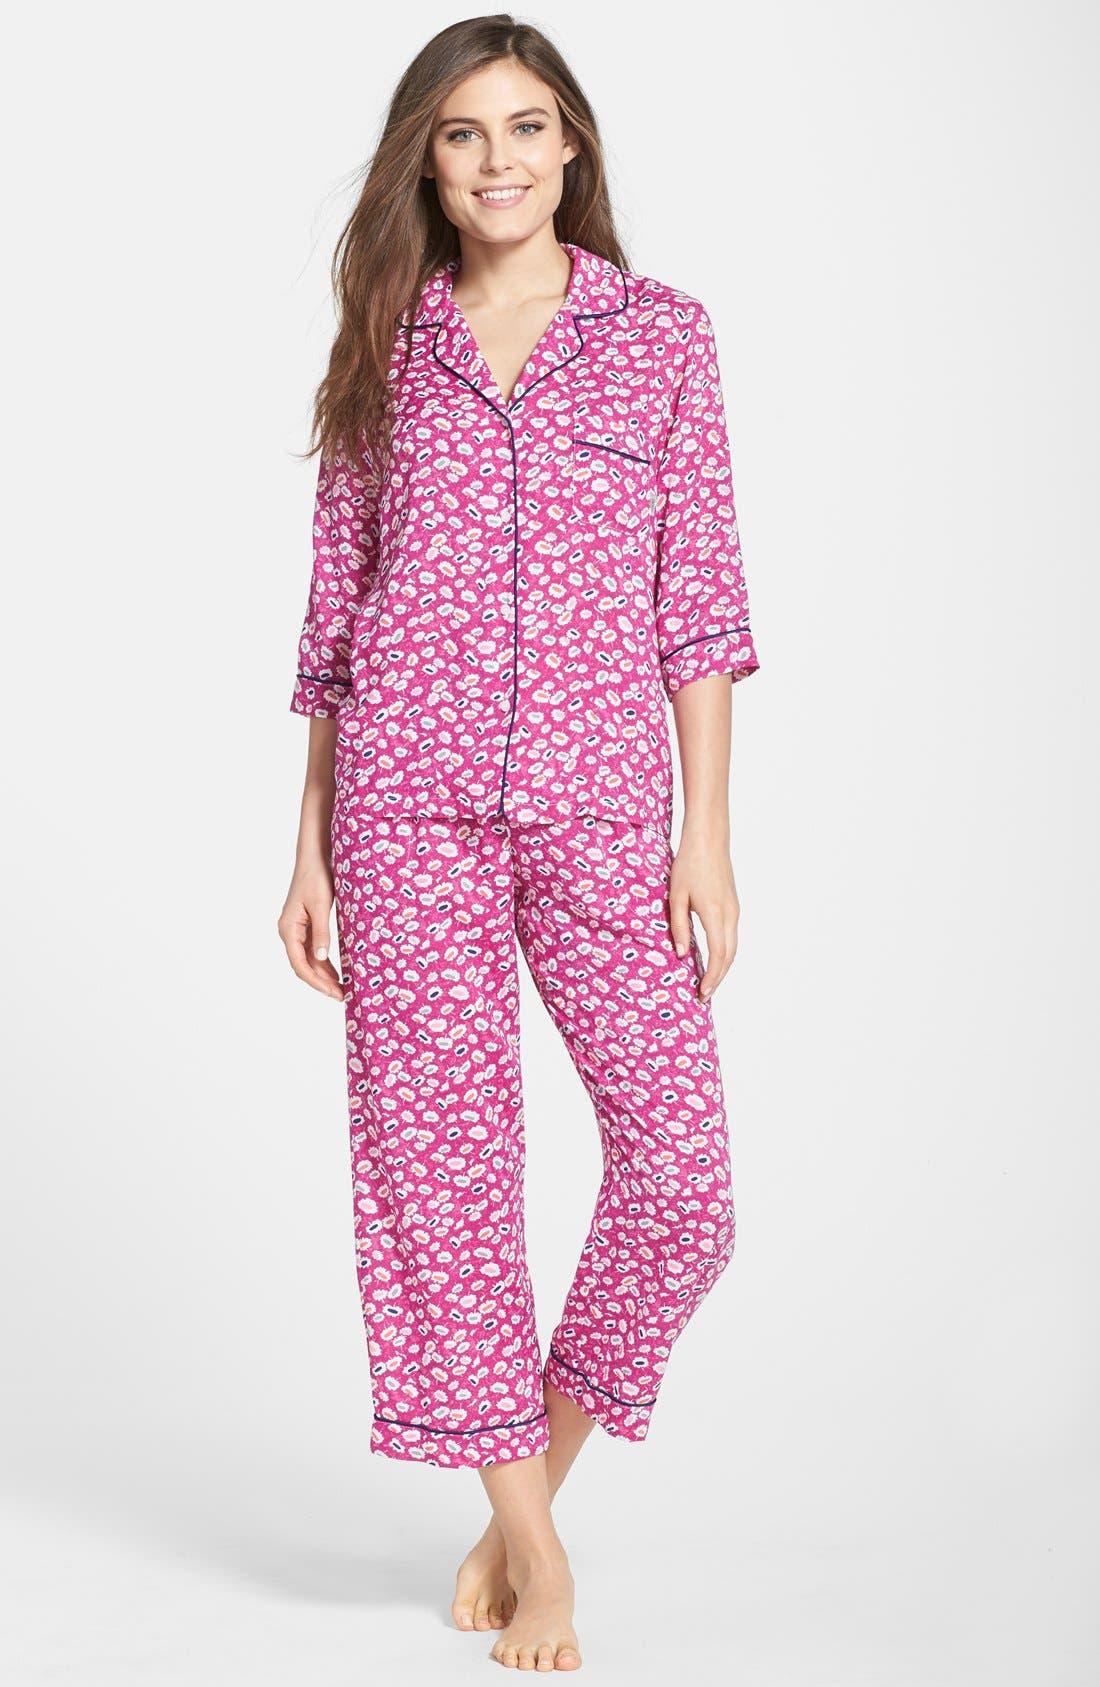 Alternate Image 1 Selected - DKNY Print Capri Pajamas